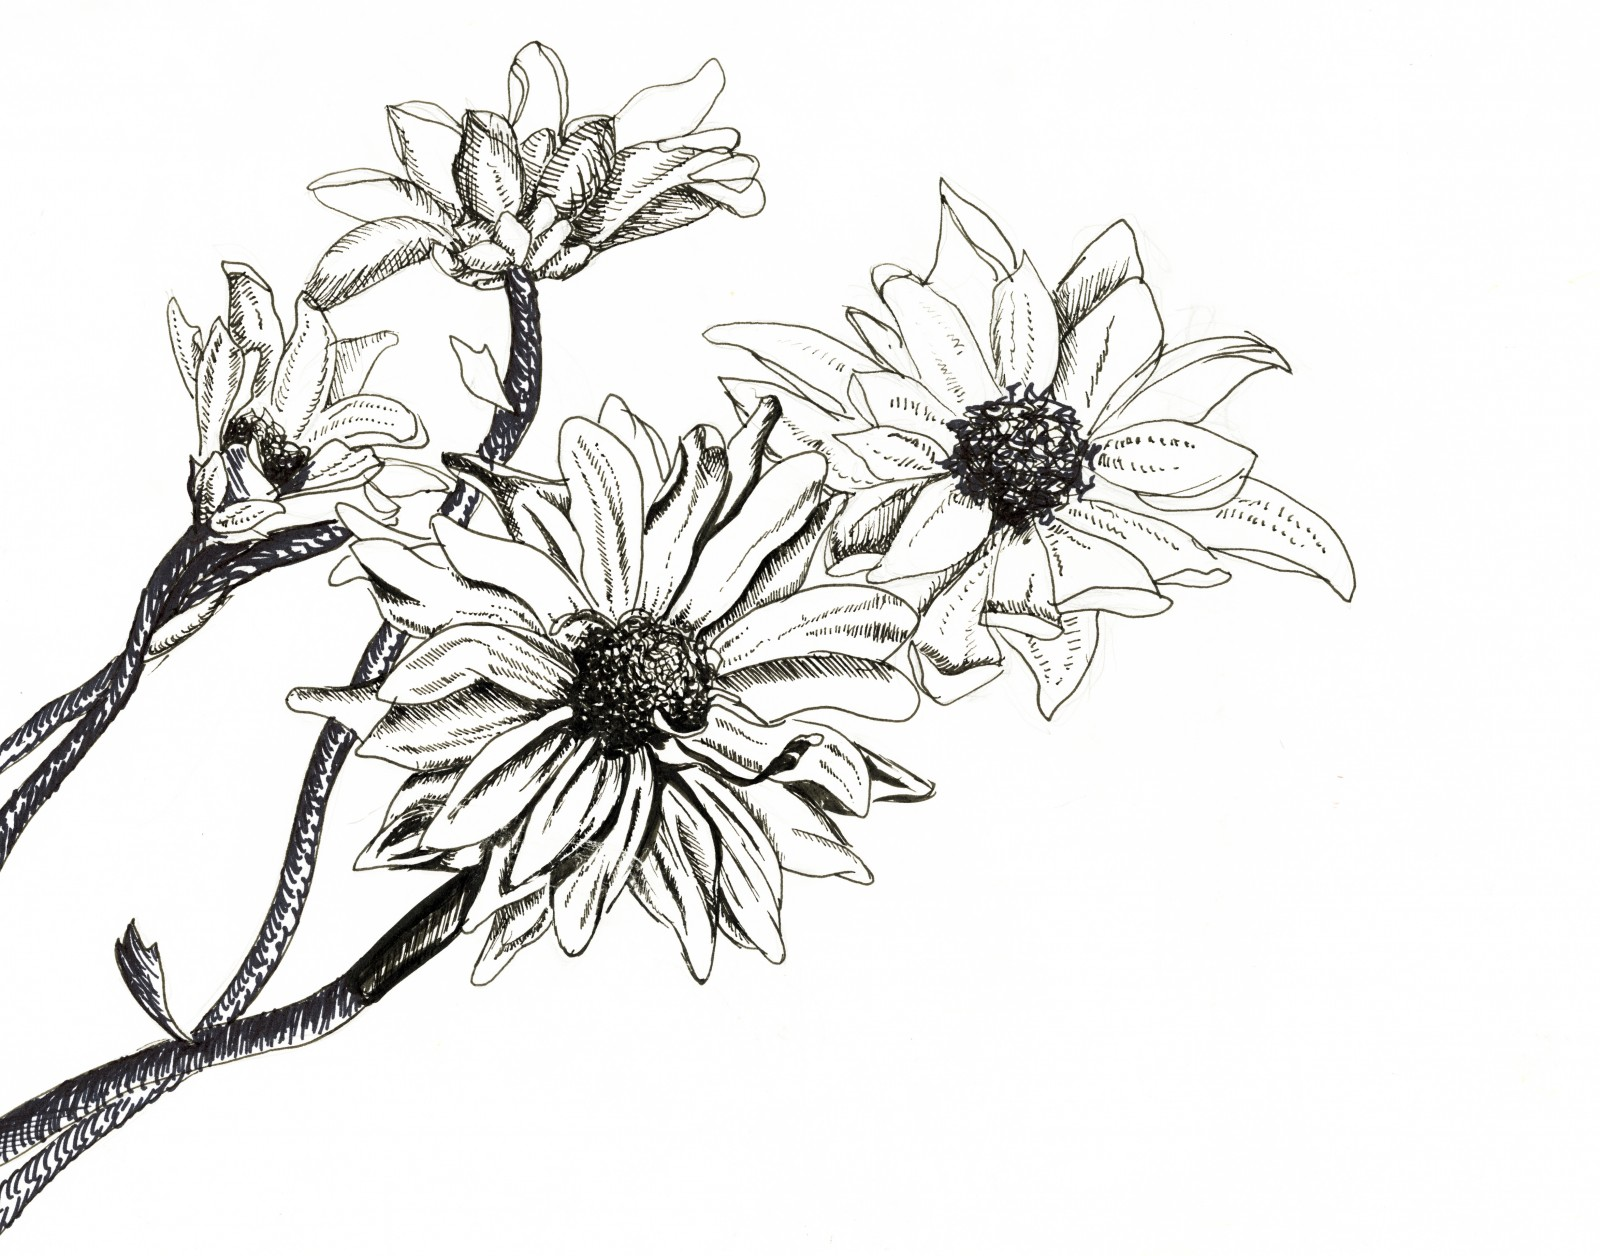 Drawn rose bush pen and ink Pinterest Google pen crafty drawing